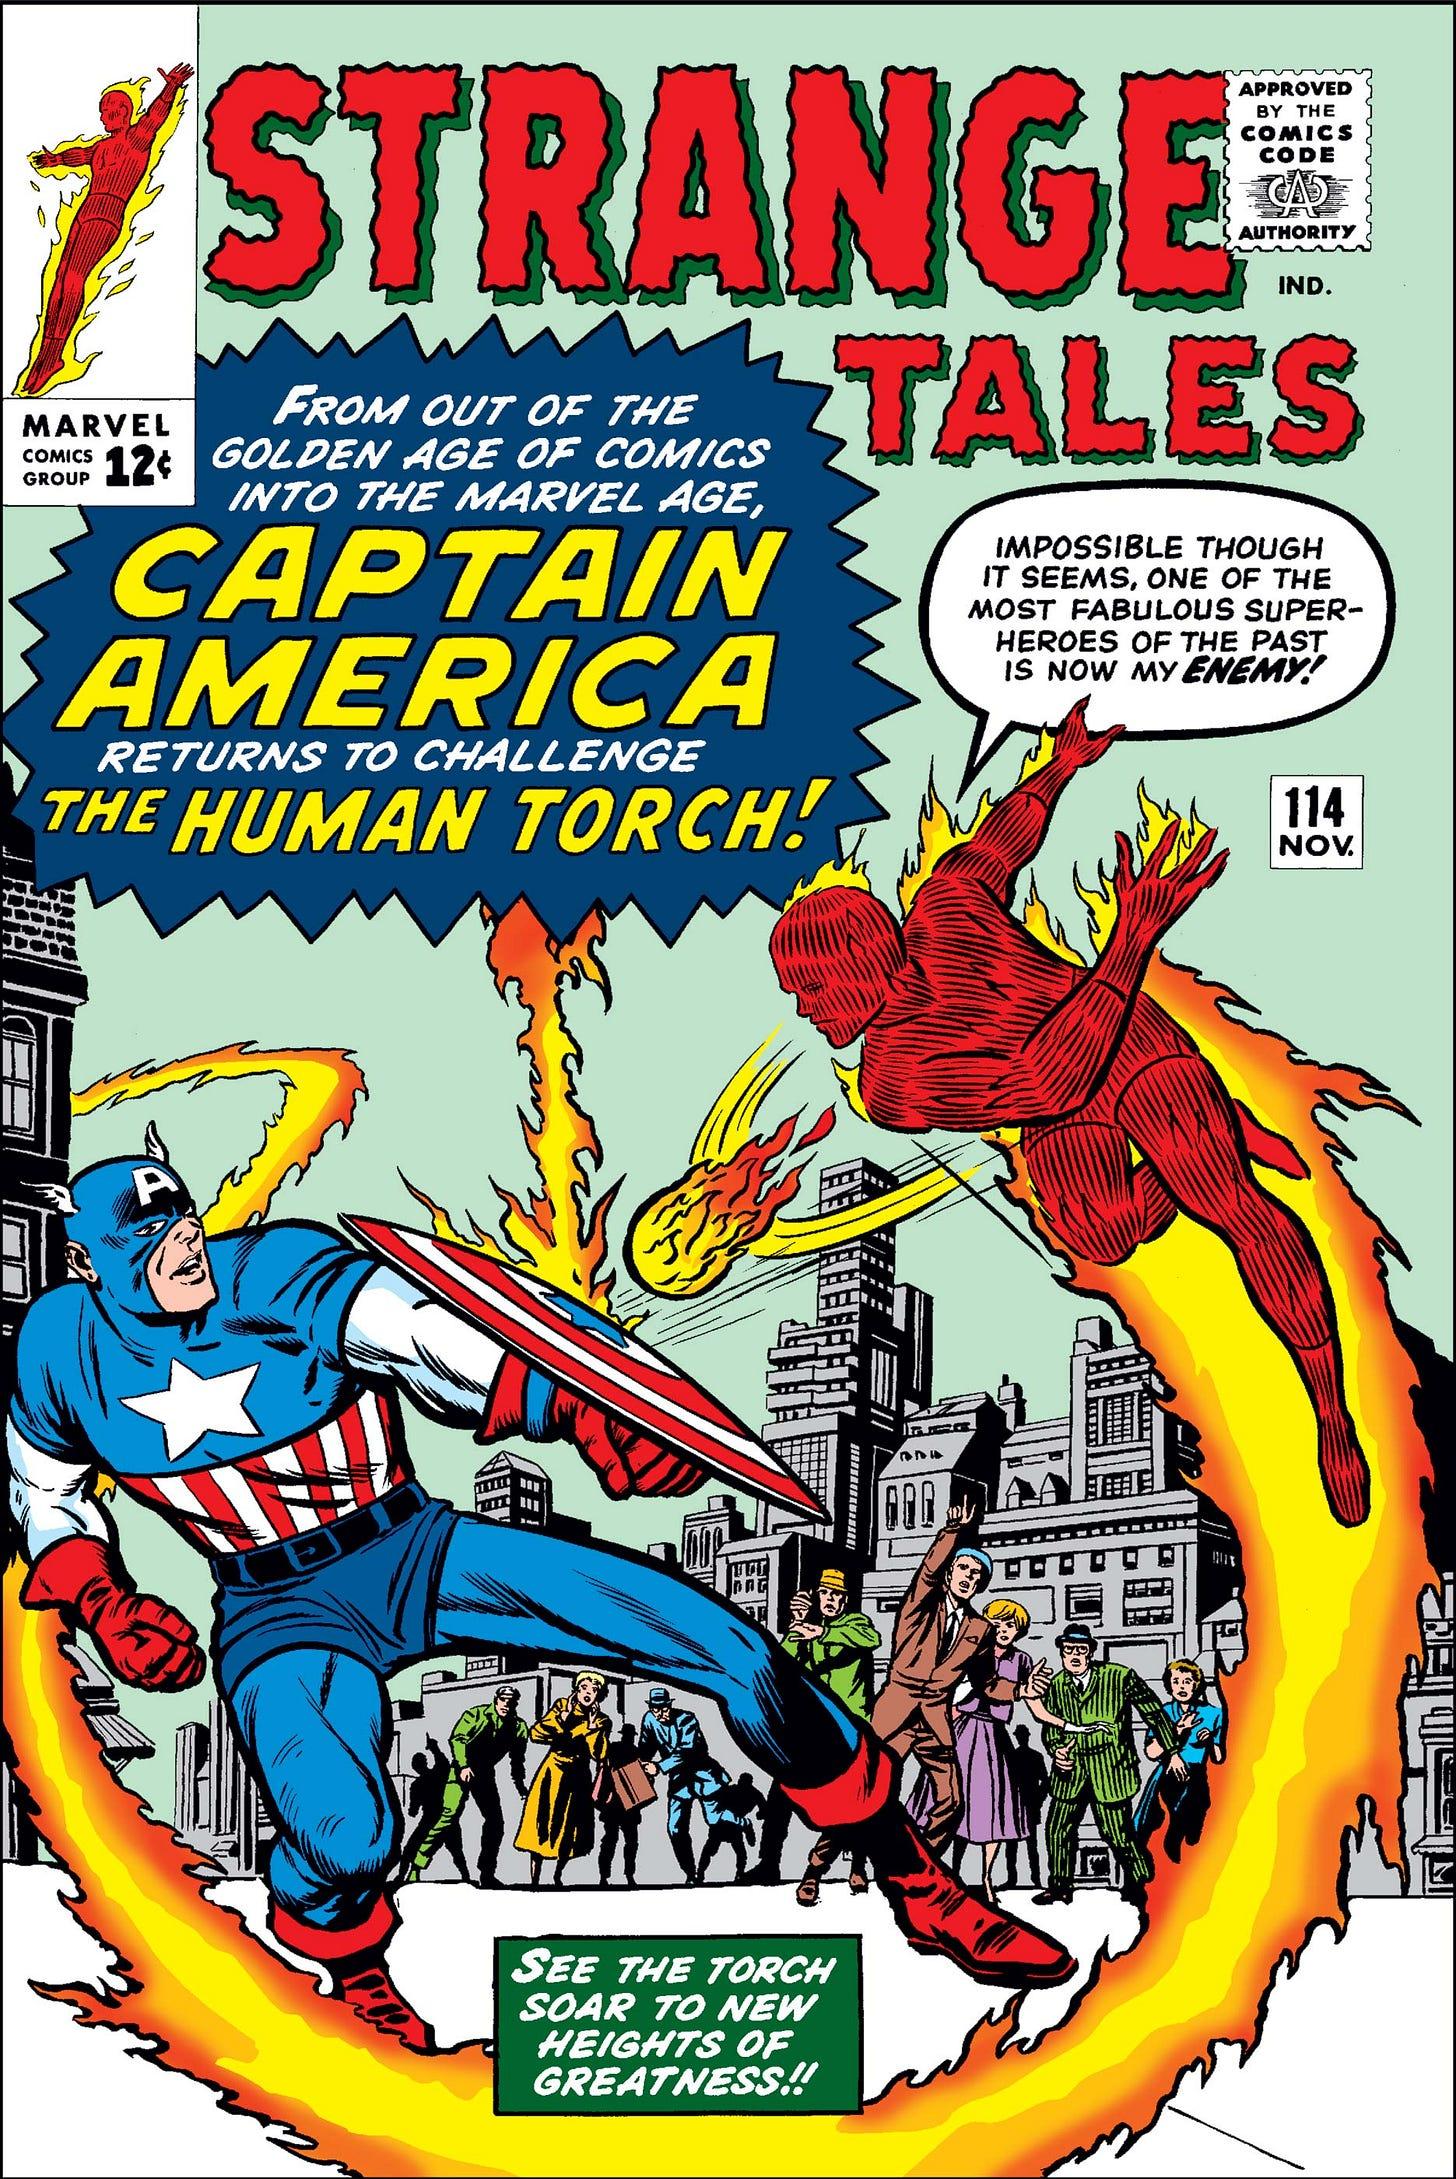 Strange Tales (1951) #114 | Comic Issues | Marvel